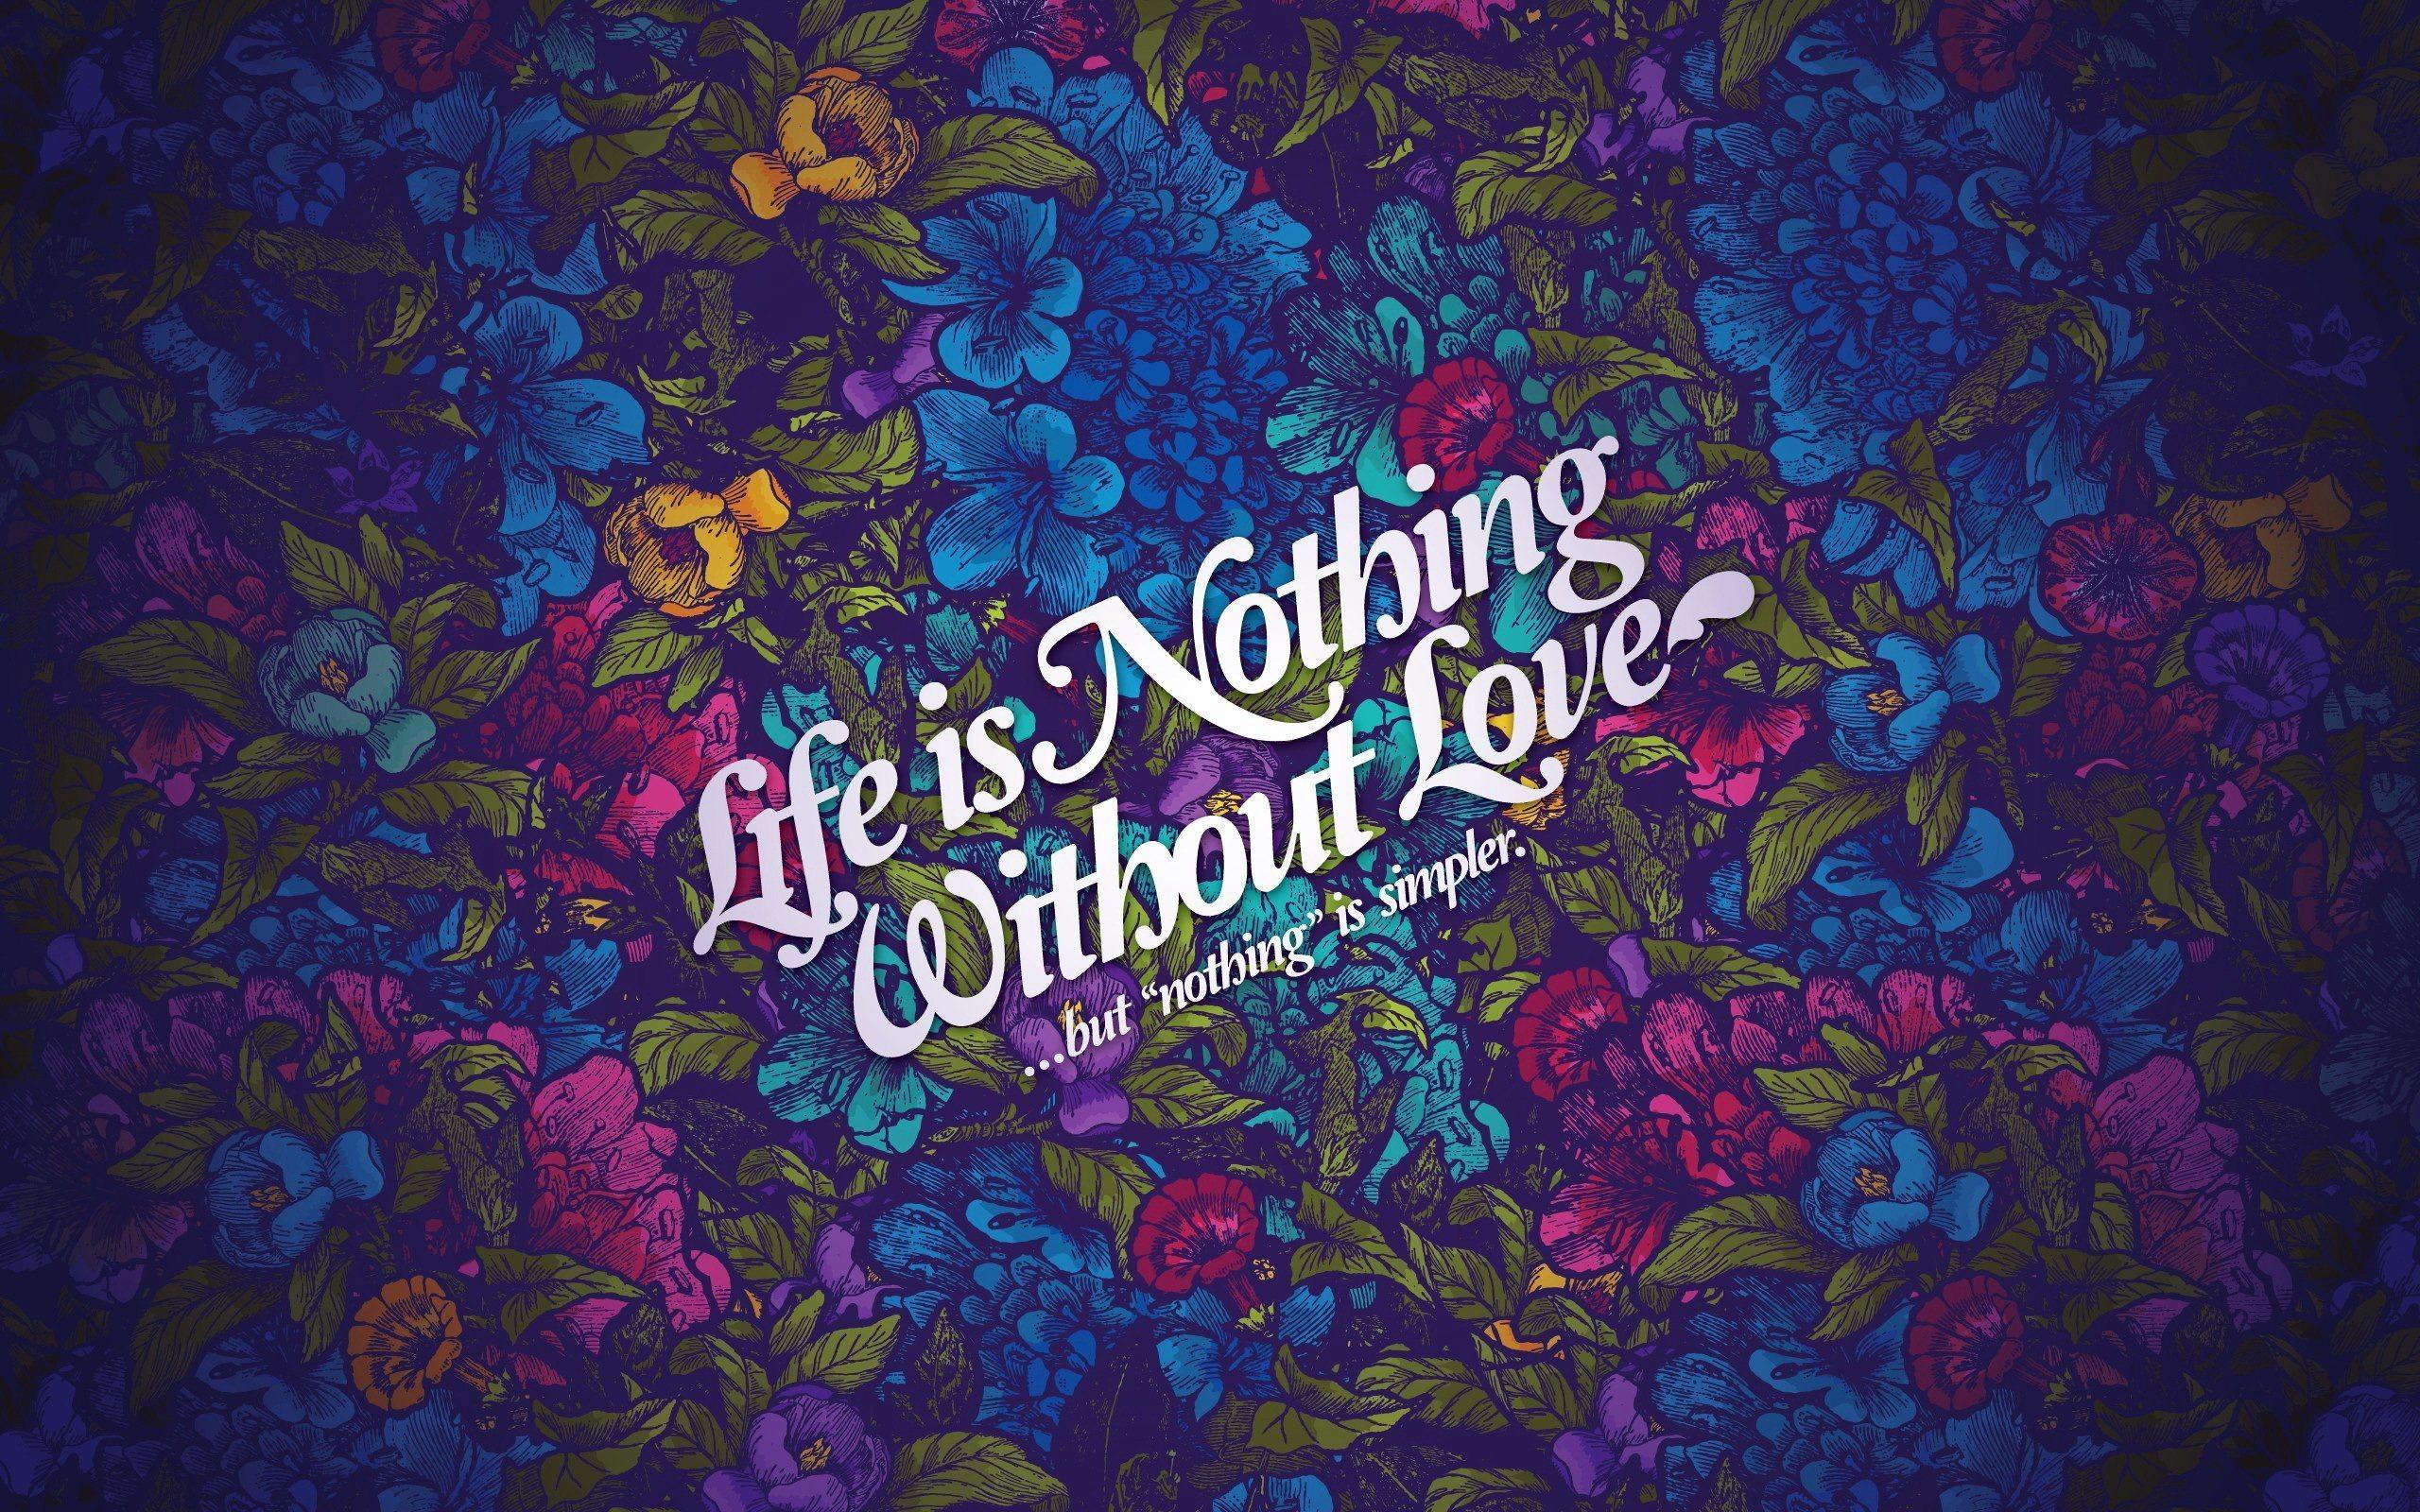 WallpapersWide.com | Love HD Desktop Wallpapers for ...